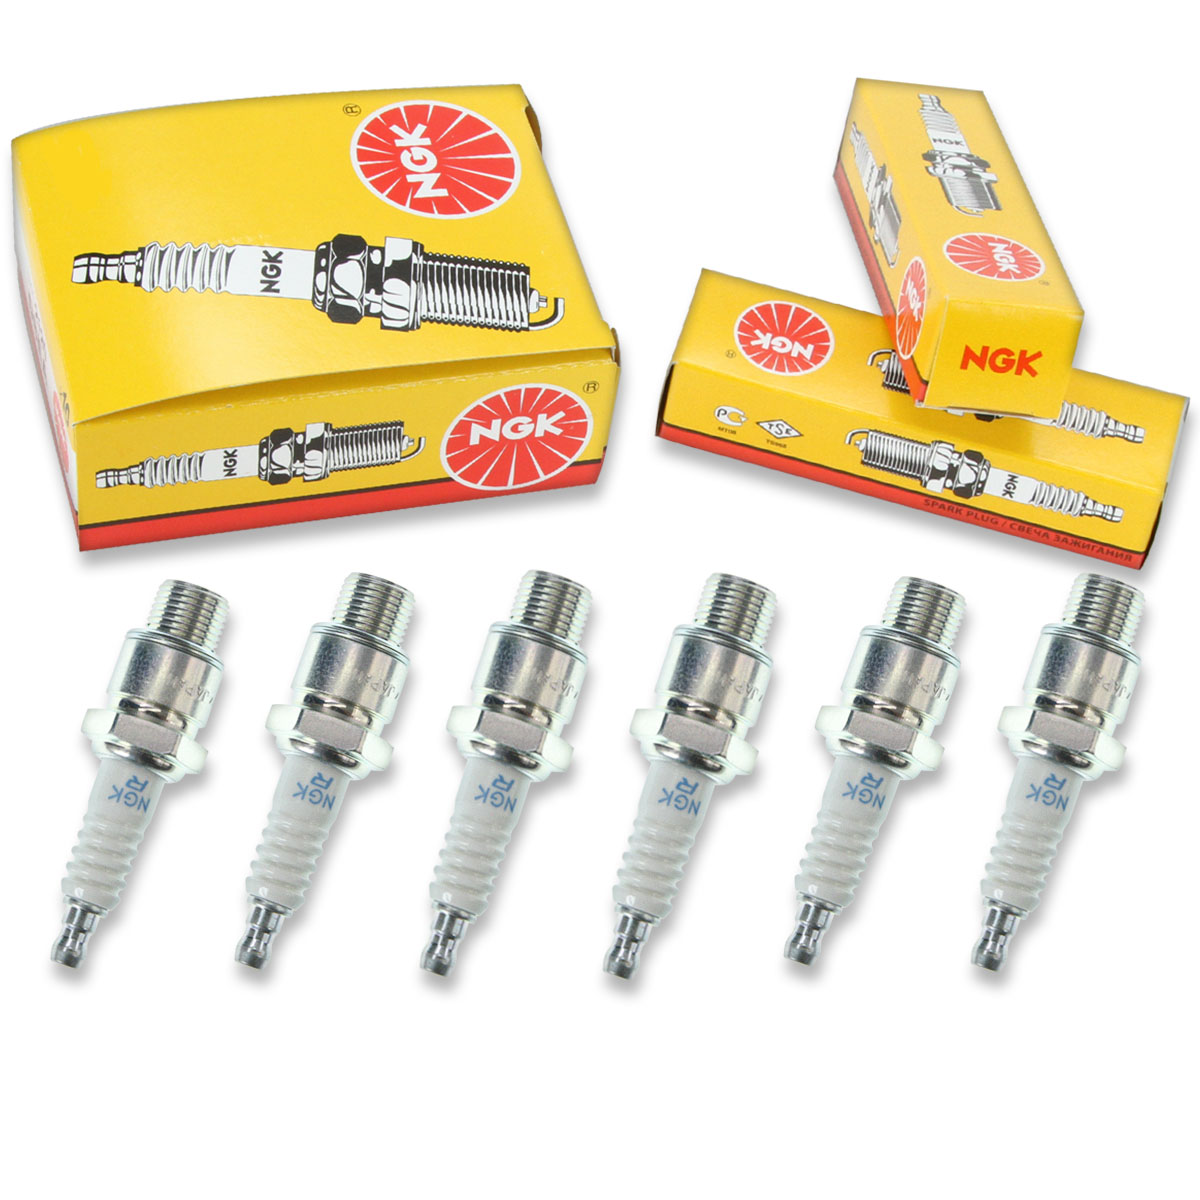 New NGK Standard Spark Plug BUZHW2 2173 Set of 4 Spark Plugs